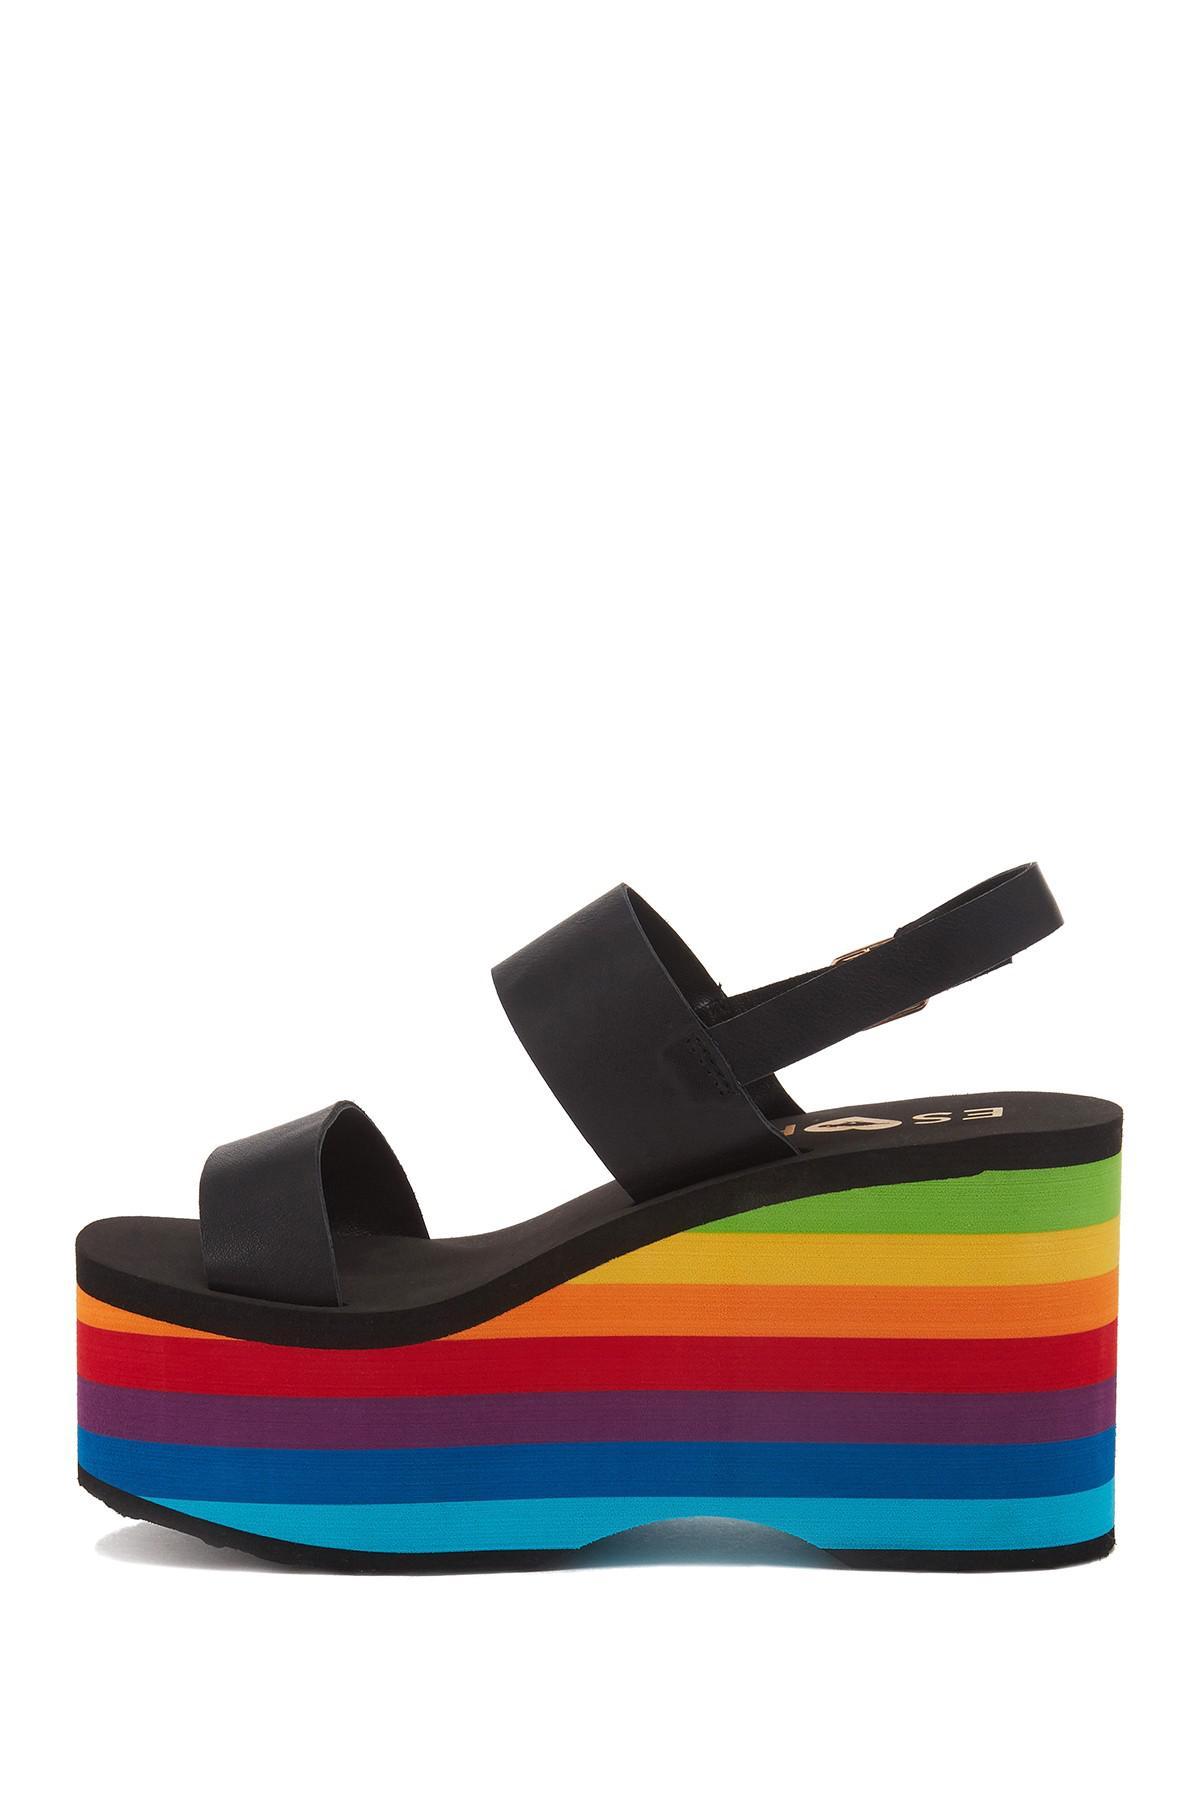 9539fd3360e Lyst - Rocket Dog Copa Rainbow Sandals in Black